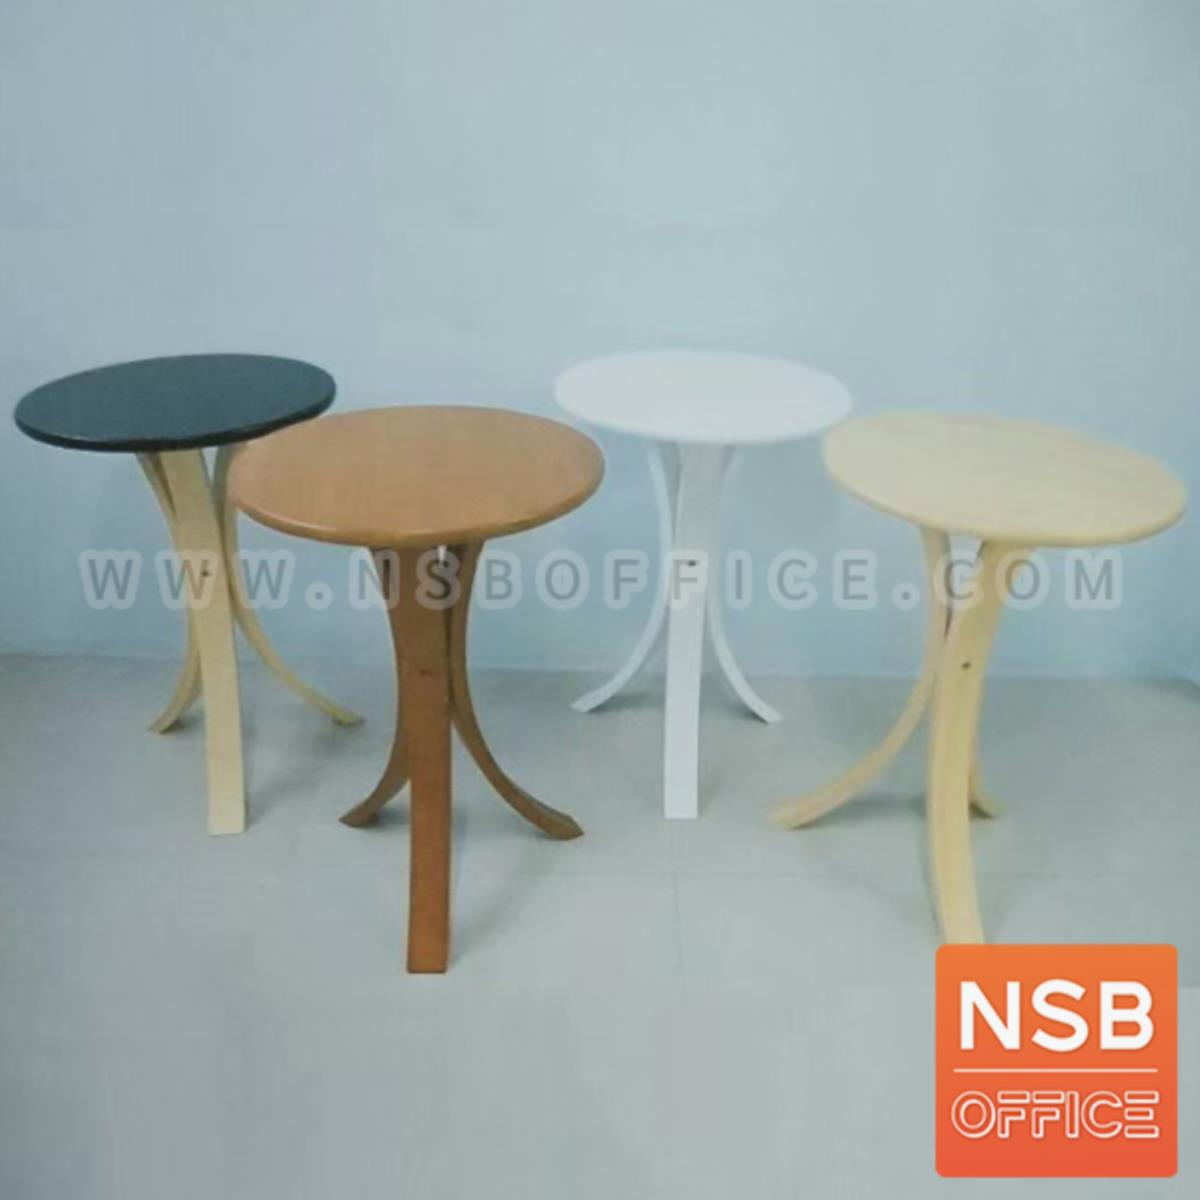 G20A005:โต๊ะไม้ยางพารากลม รุ่น raden (บราเดน) ขนาด 45Di*68H cm. ขาโค้ง